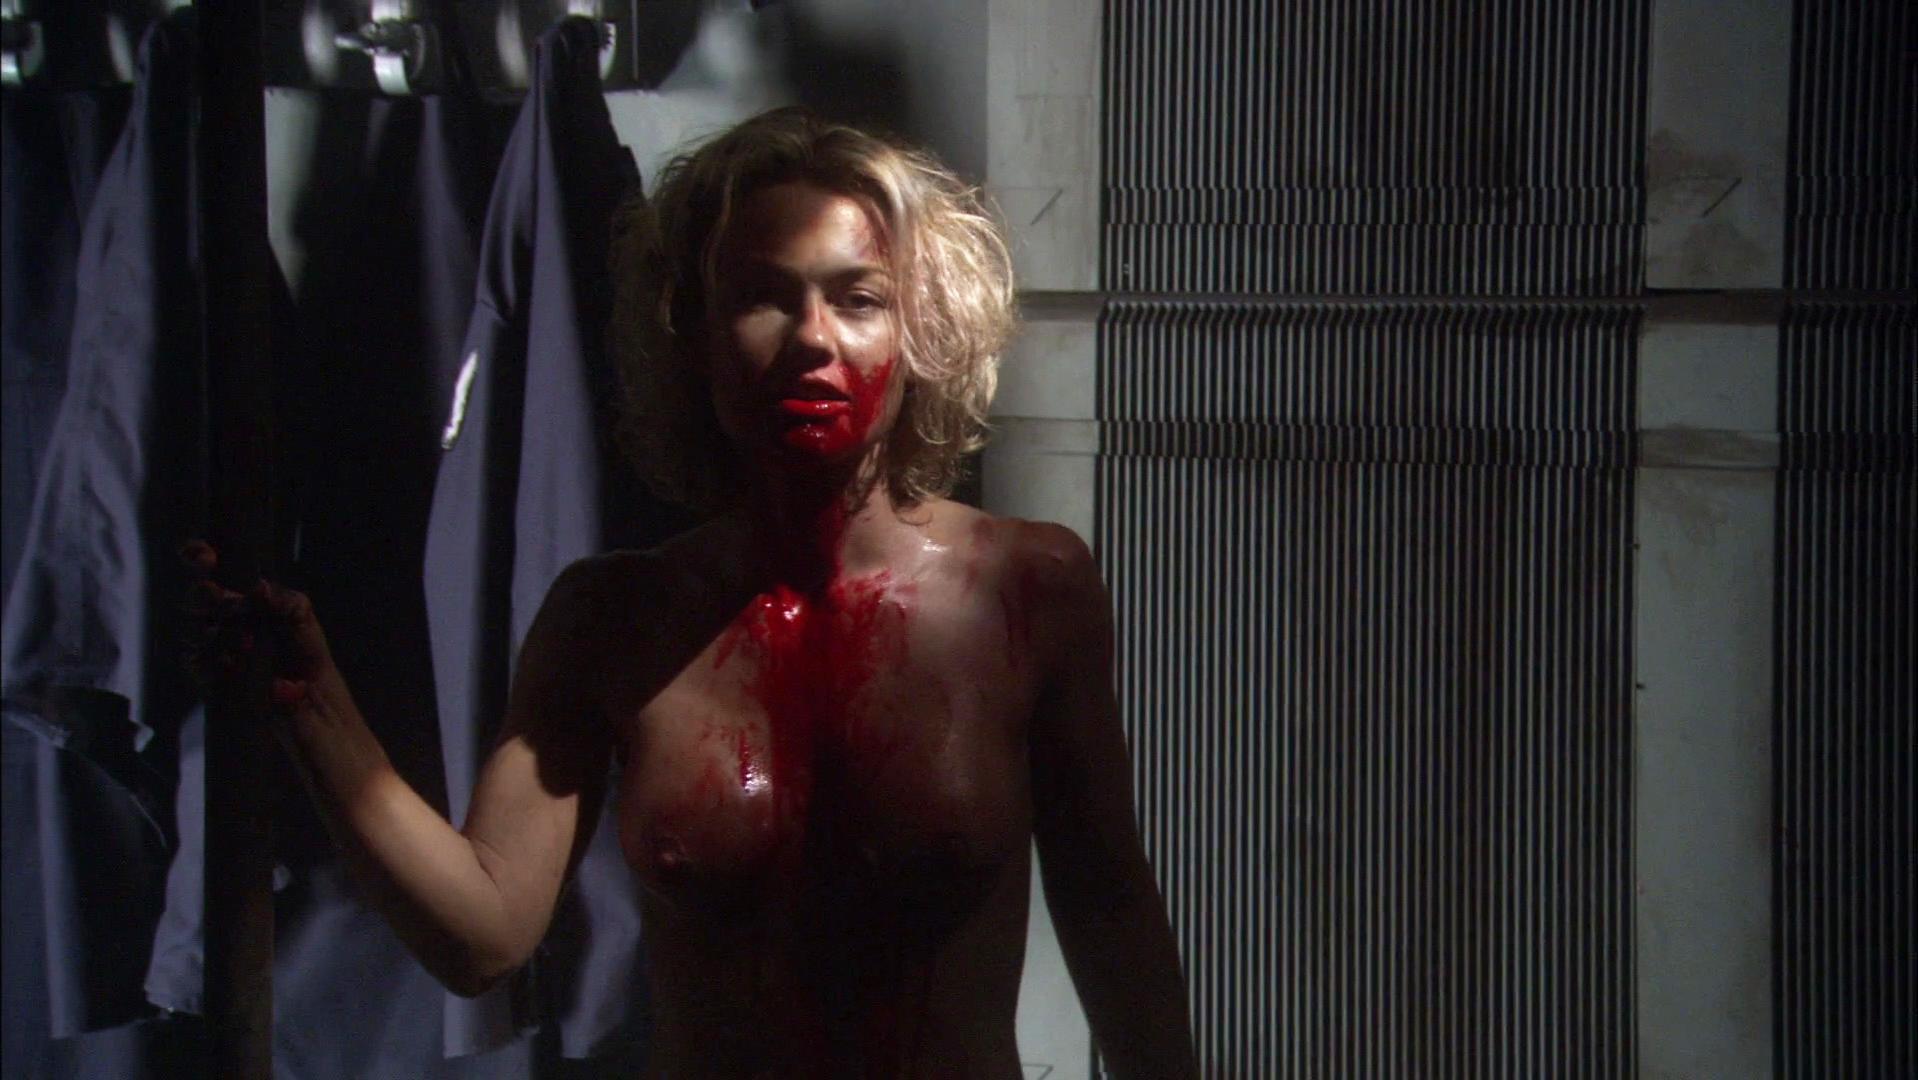 Starship troopers 2 sex scene